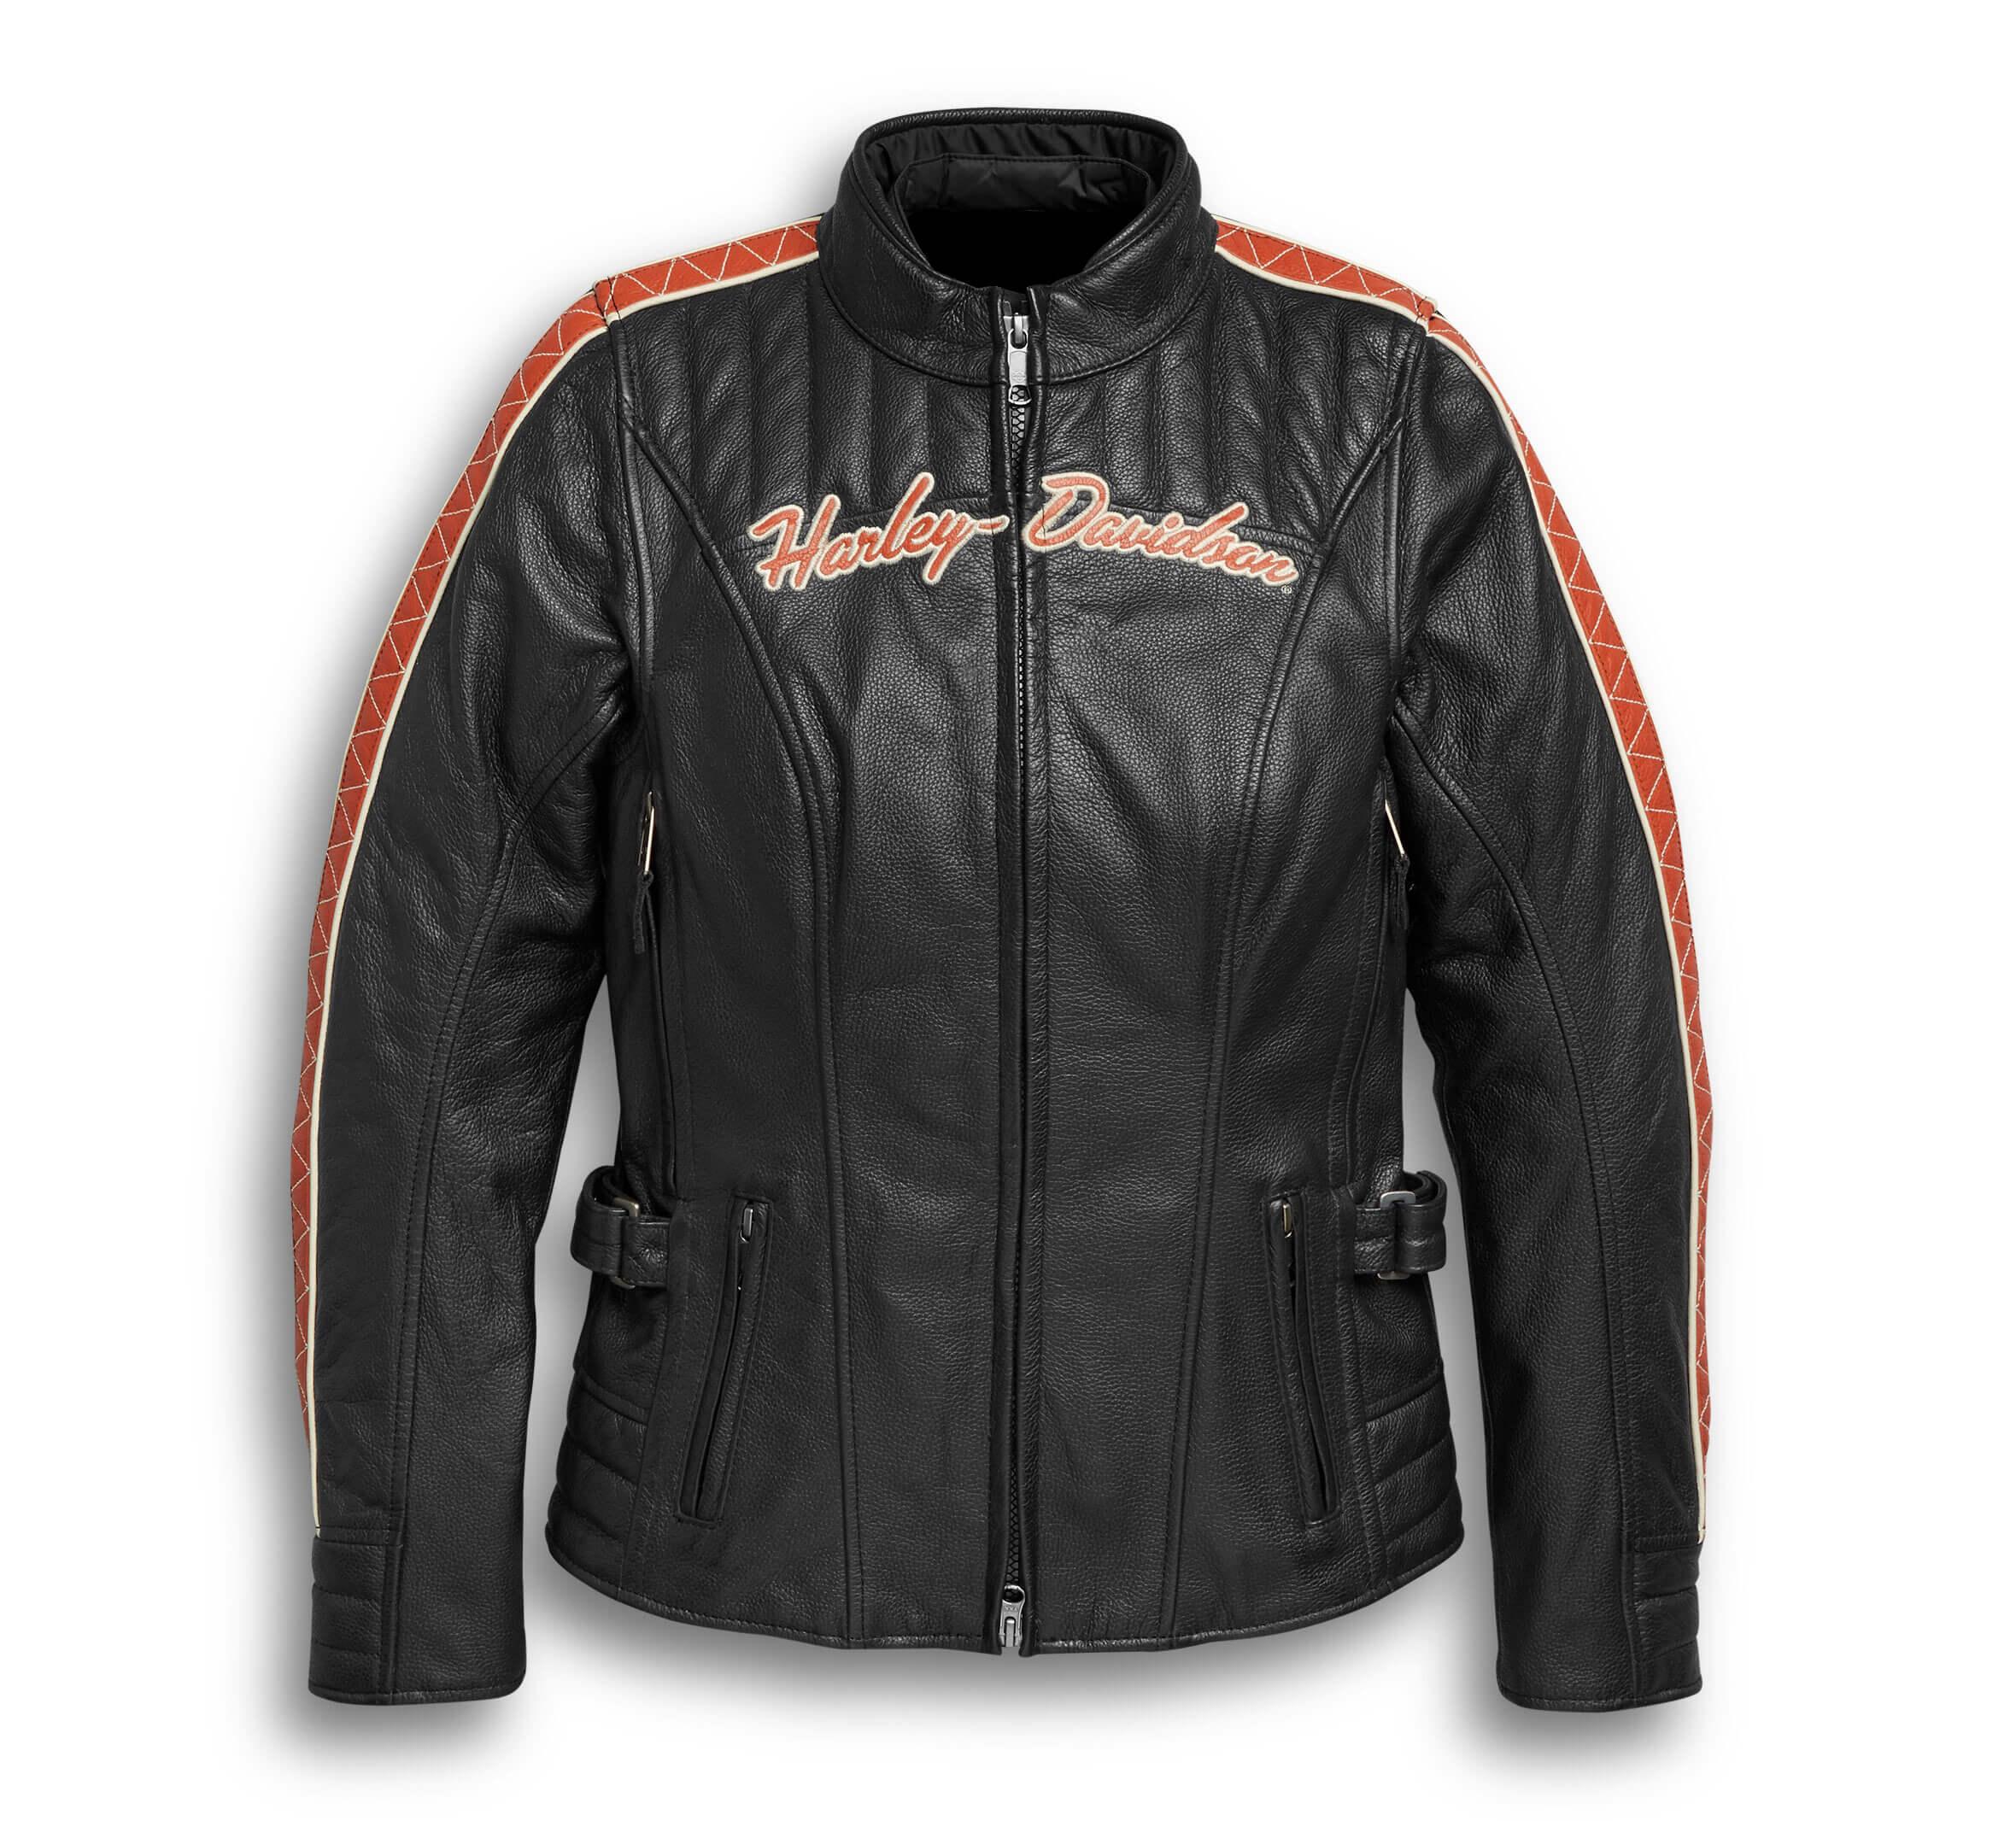 Motorcycle Black Harley Davidson Leather Jacket